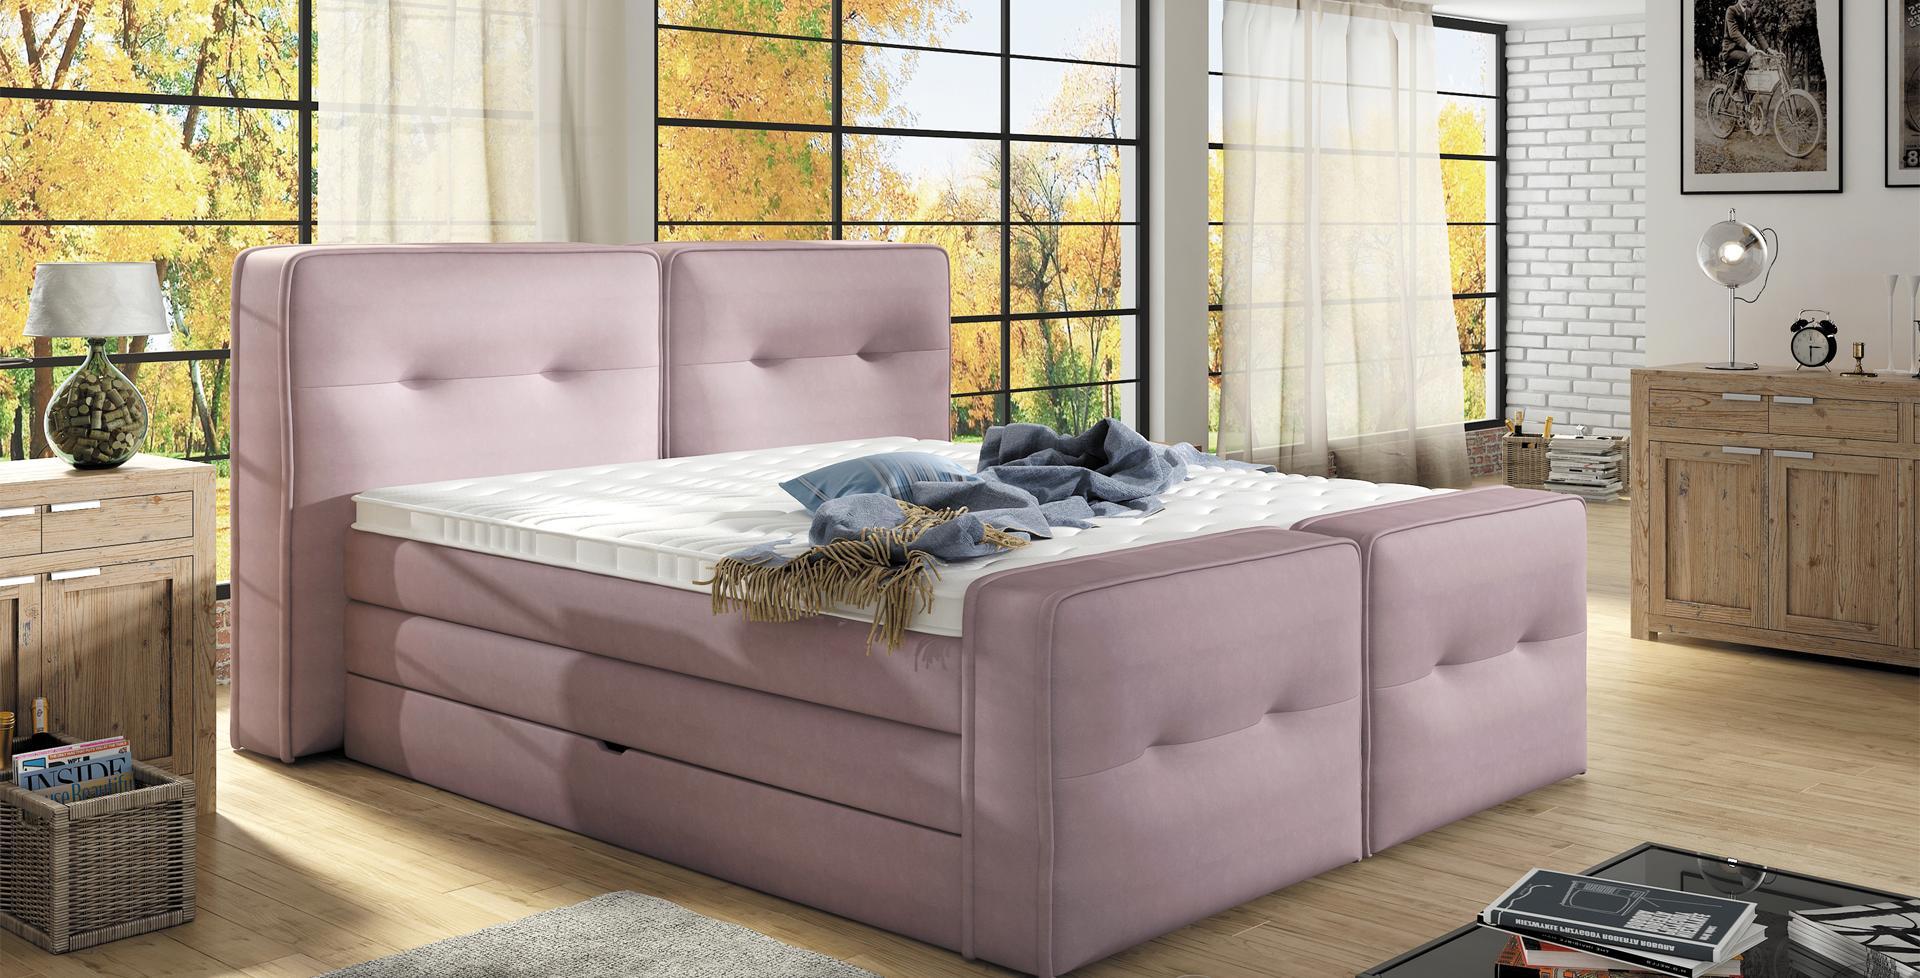 boxspringbett design bett topper federkern doppelbett polsterbett mit bettkasten falun xl www. Black Bedroom Furniture Sets. Home Design Ideas